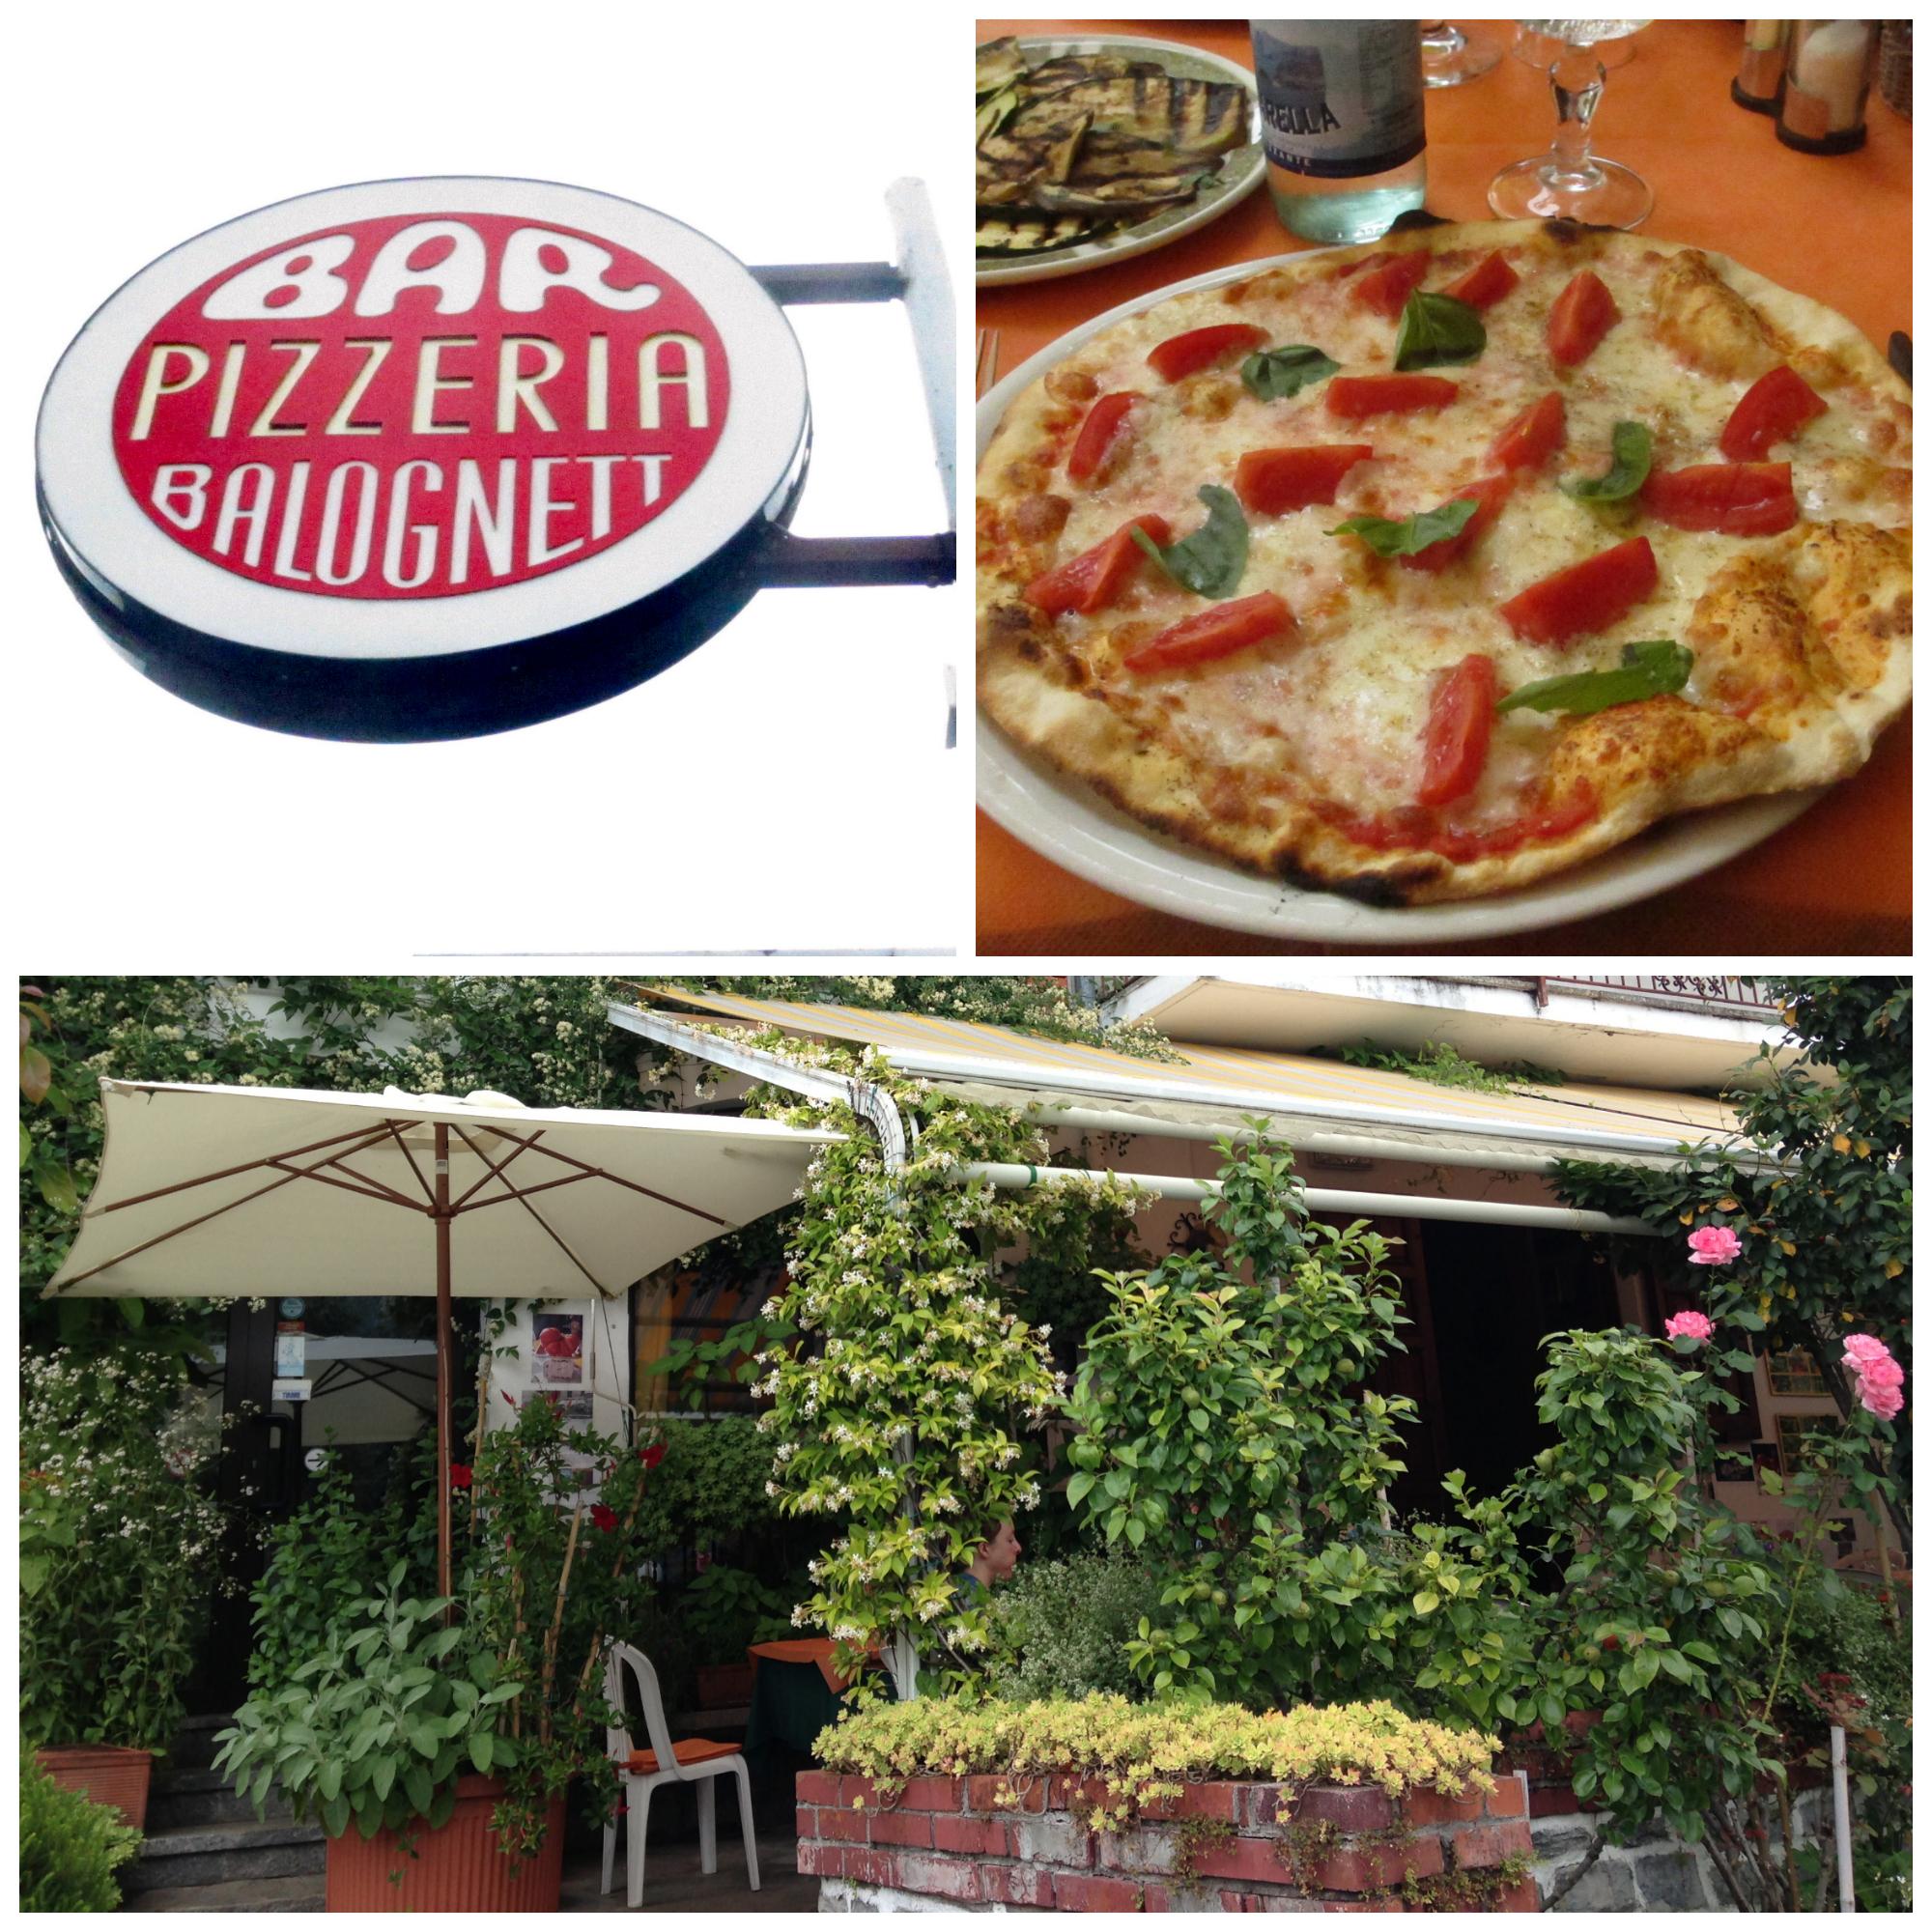 PIzzeria Balognetti